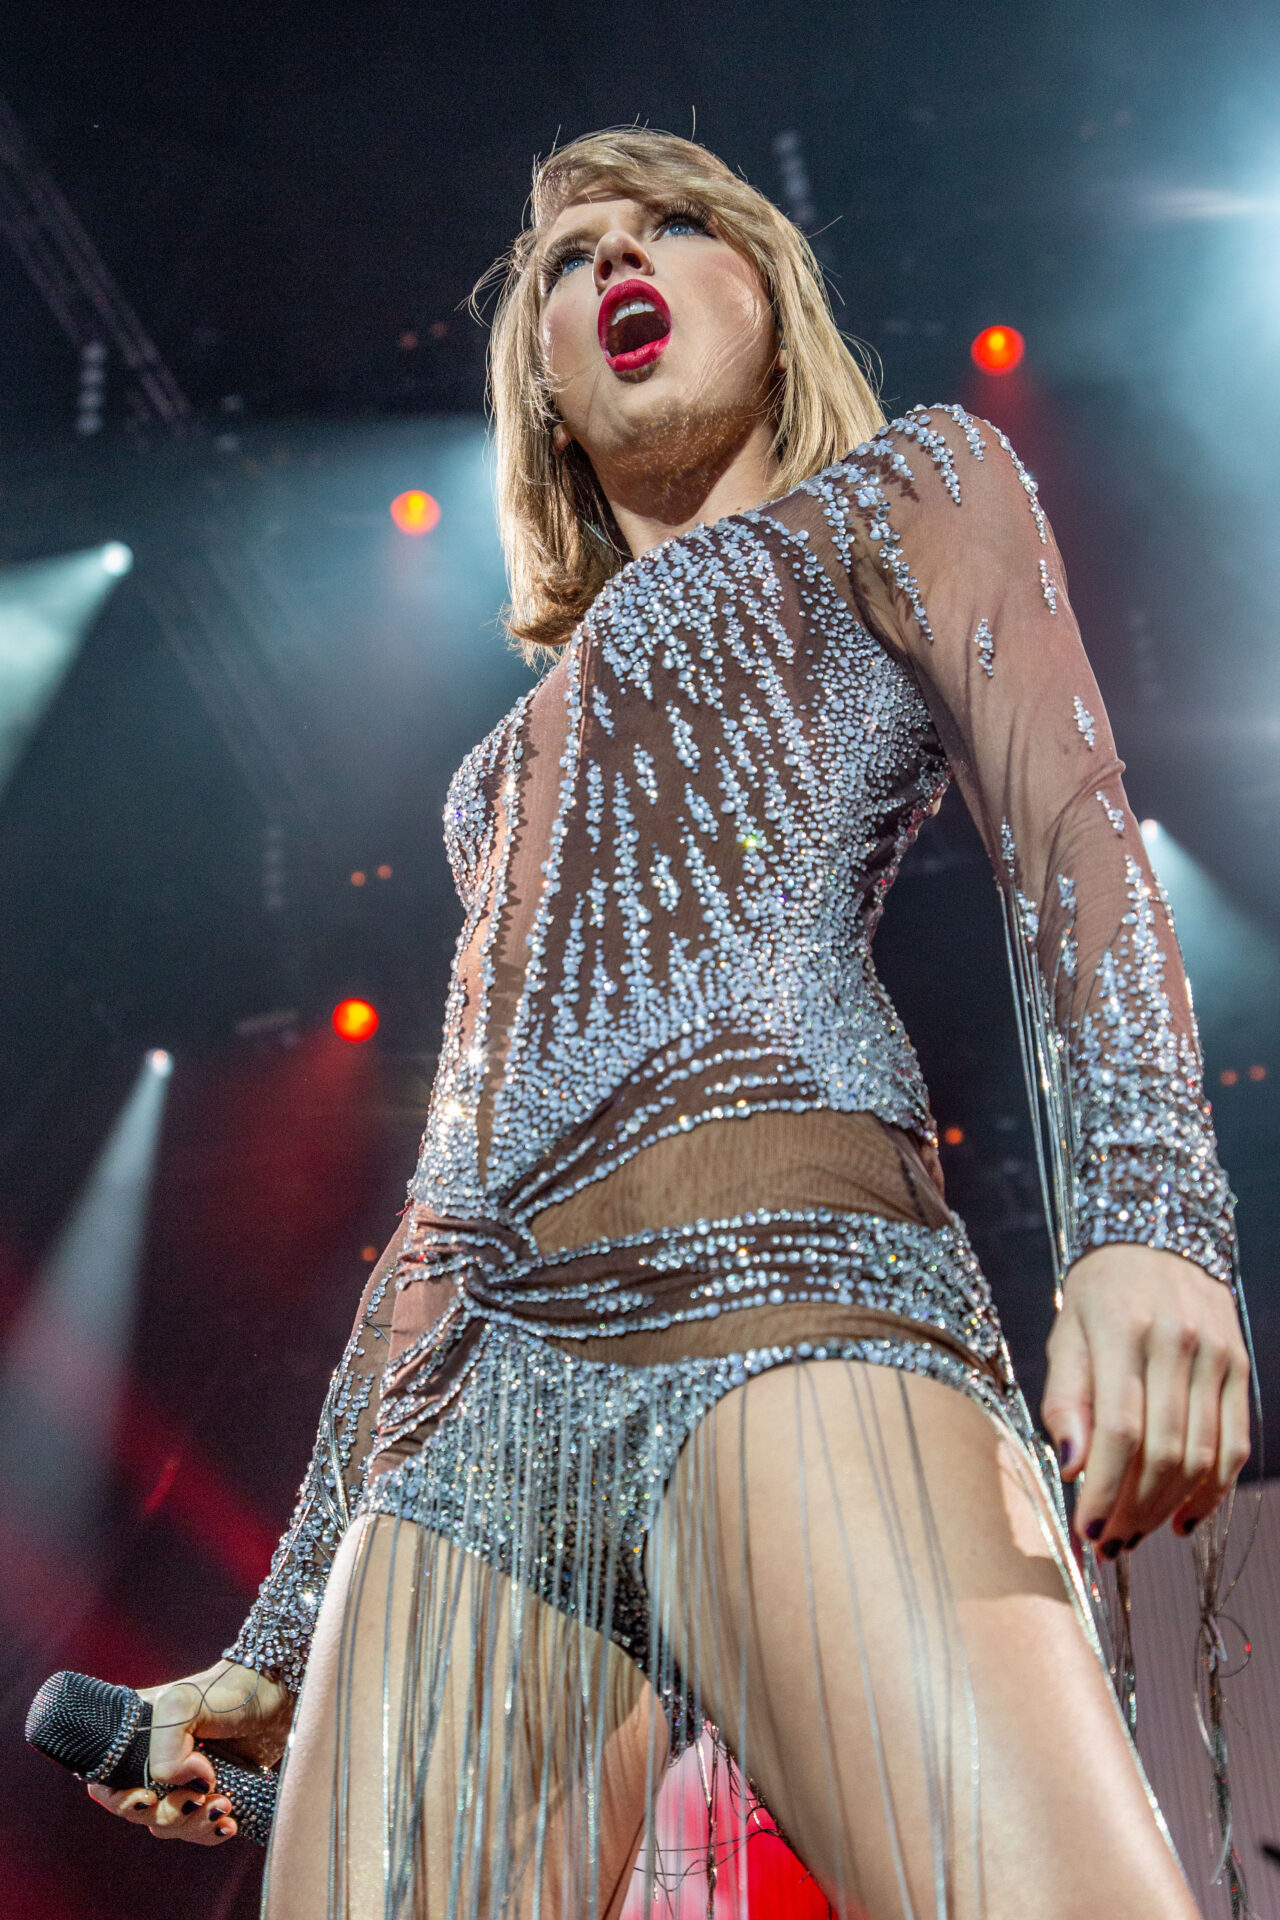 Taylor Swift Photographs